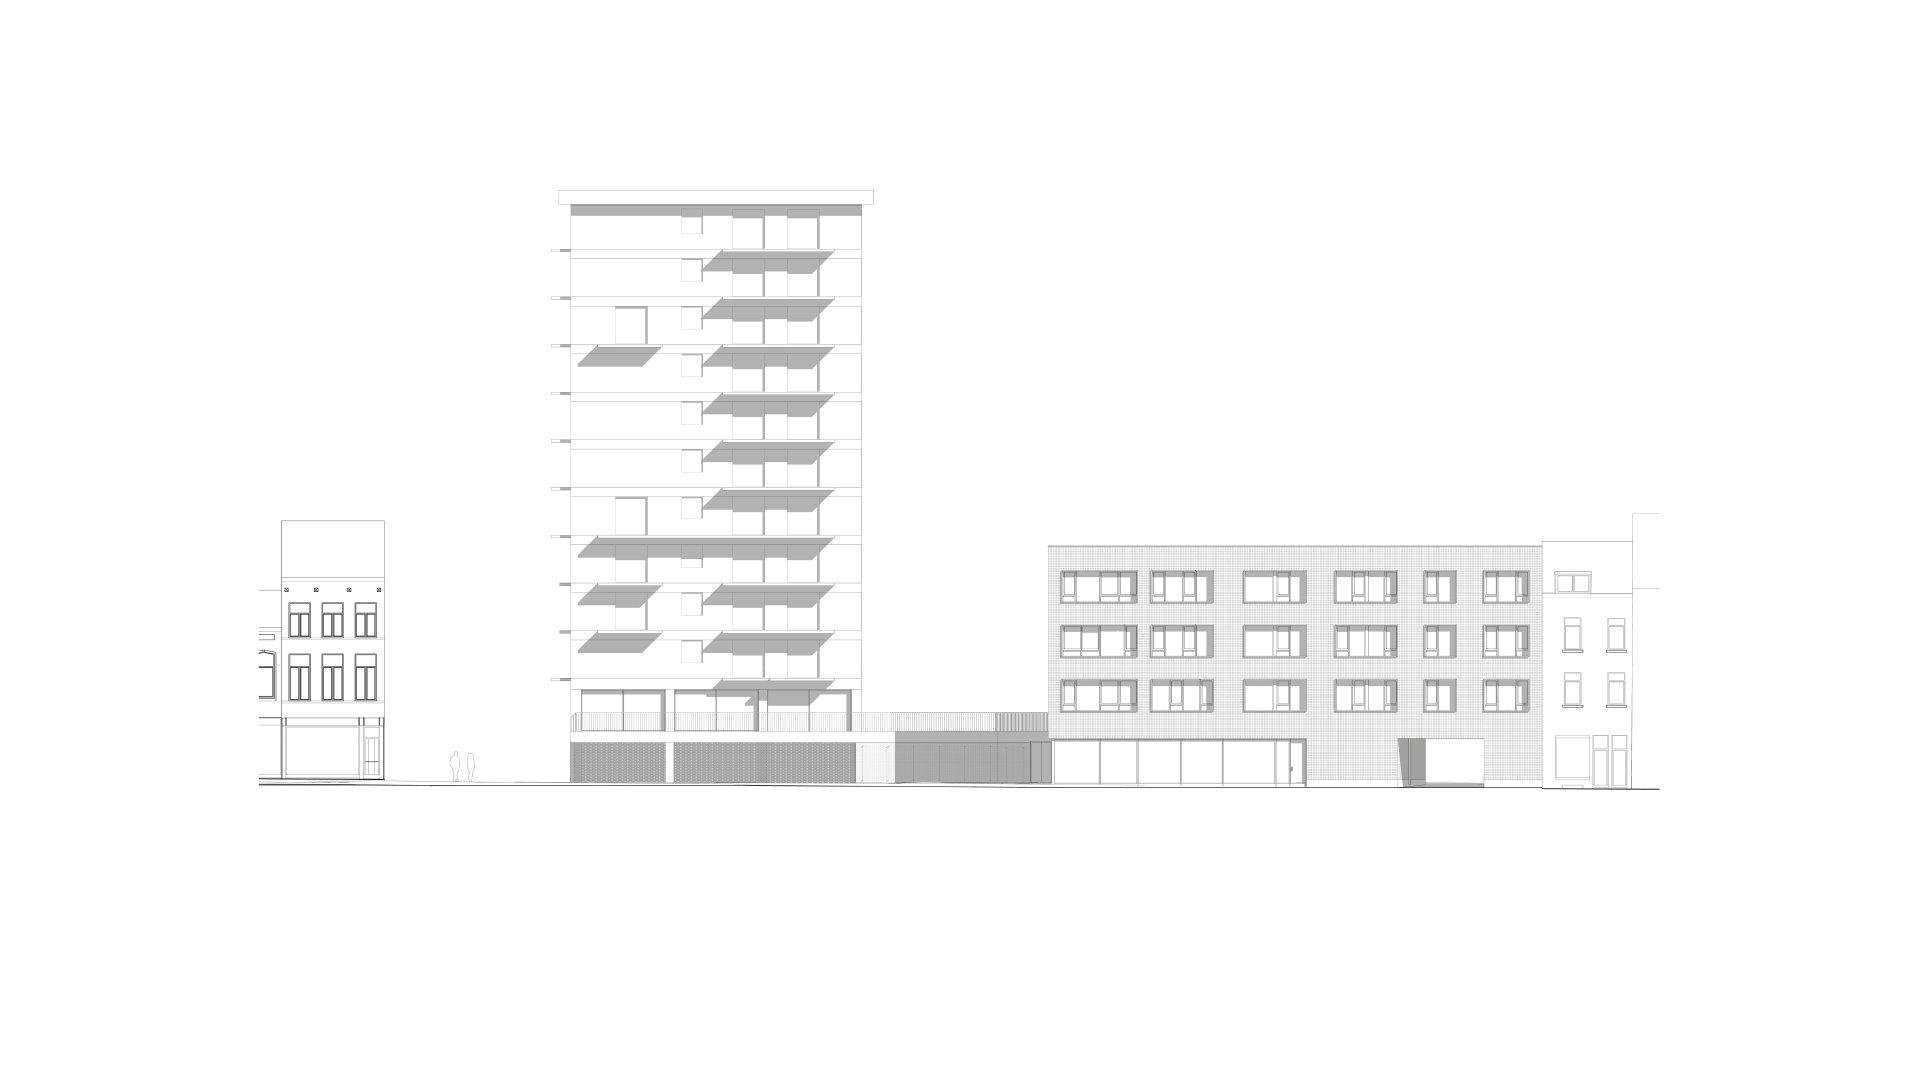 Rauter, collectieve woningen, Anderlecht-491686170